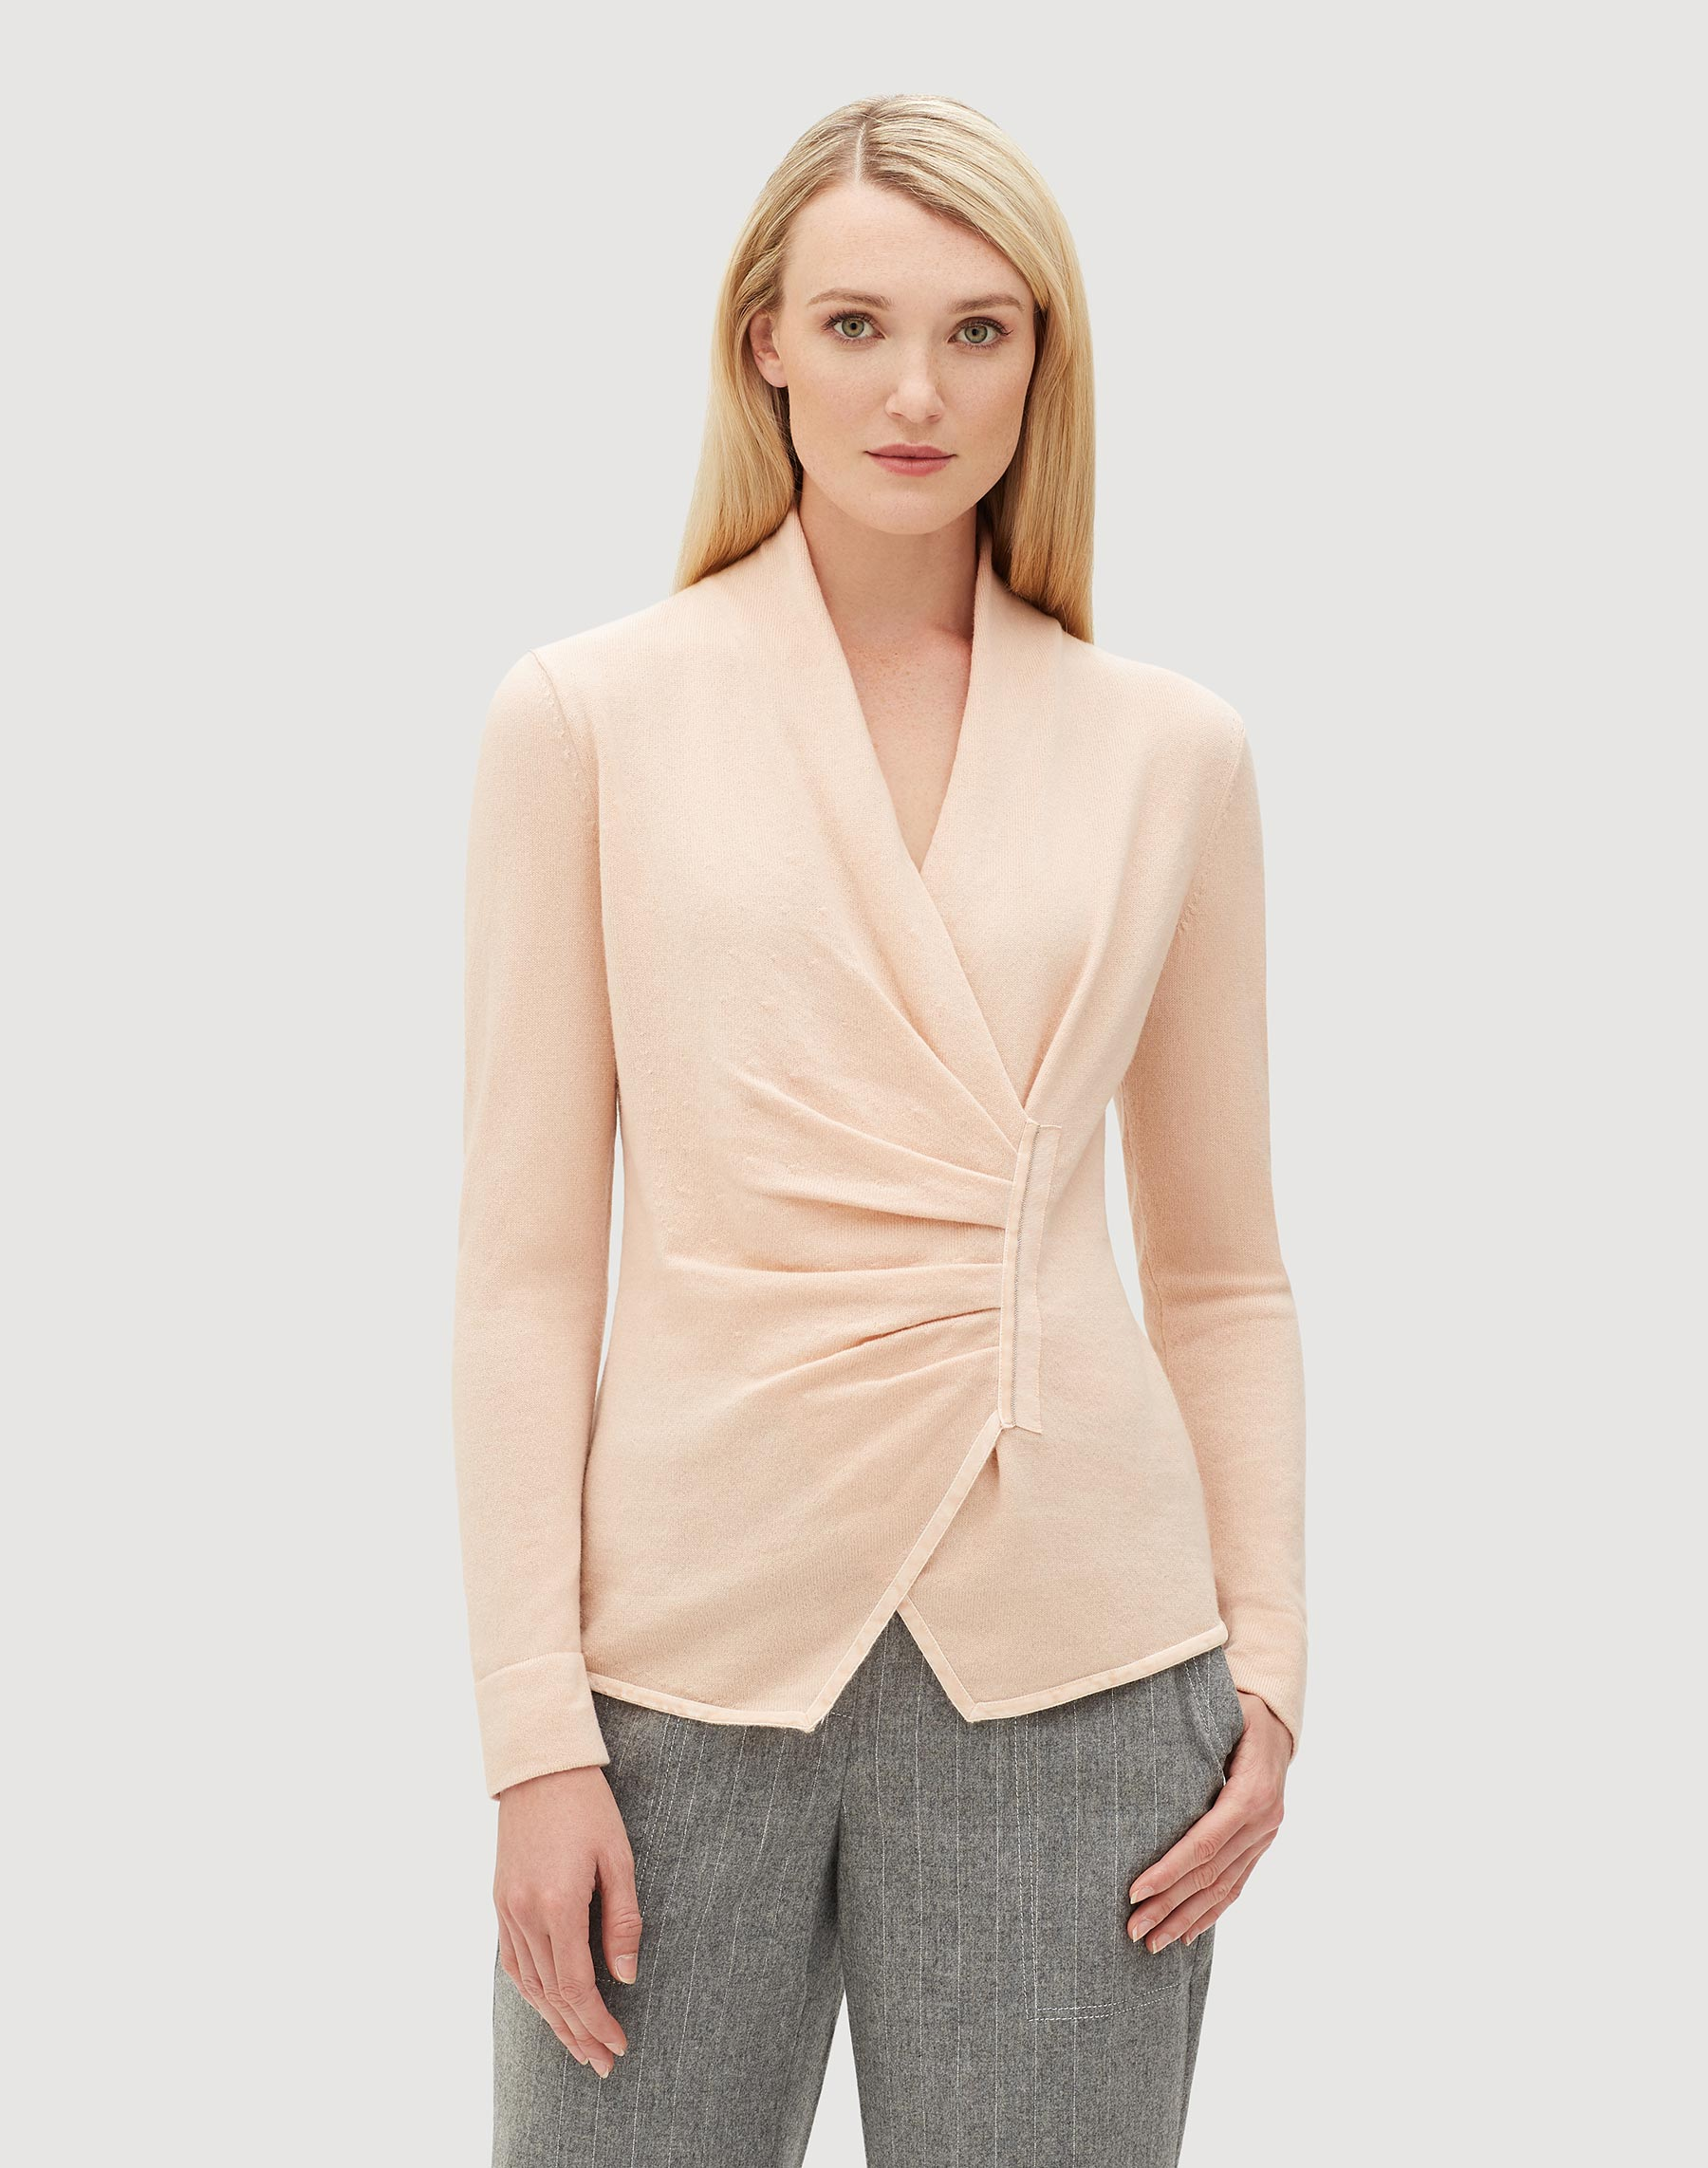 Plus Size Cashmere Asymmetrical Sweater Lafayette 148 New York